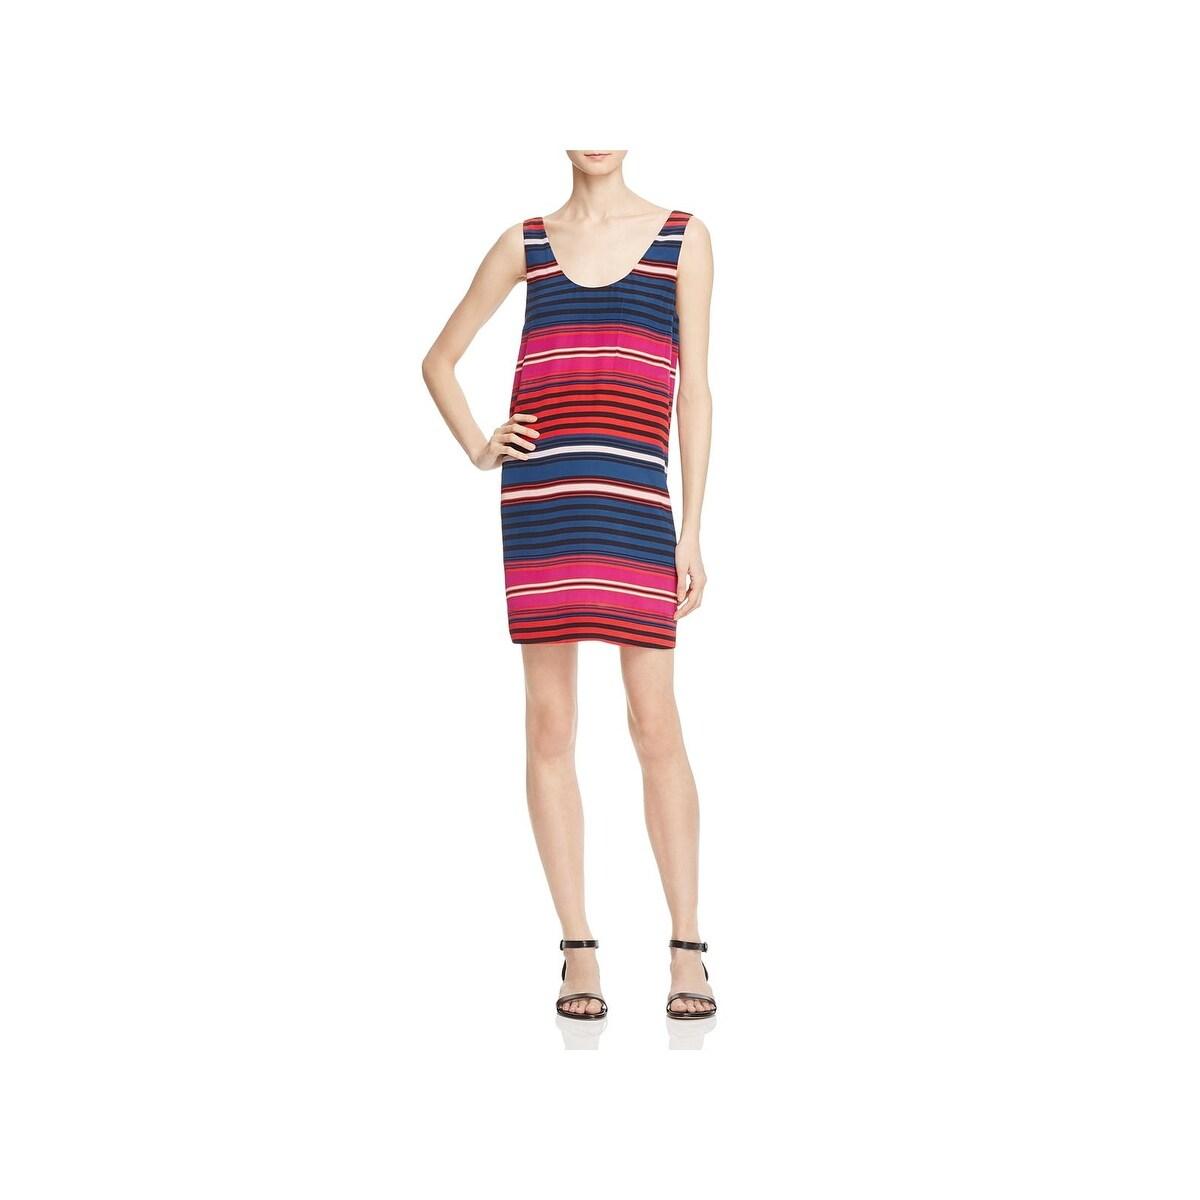 e90c9992c187e8 Shop Joie Womens Dawna Tank Dress Silk Party - Free Shipping Today -  Overstock - 23033651